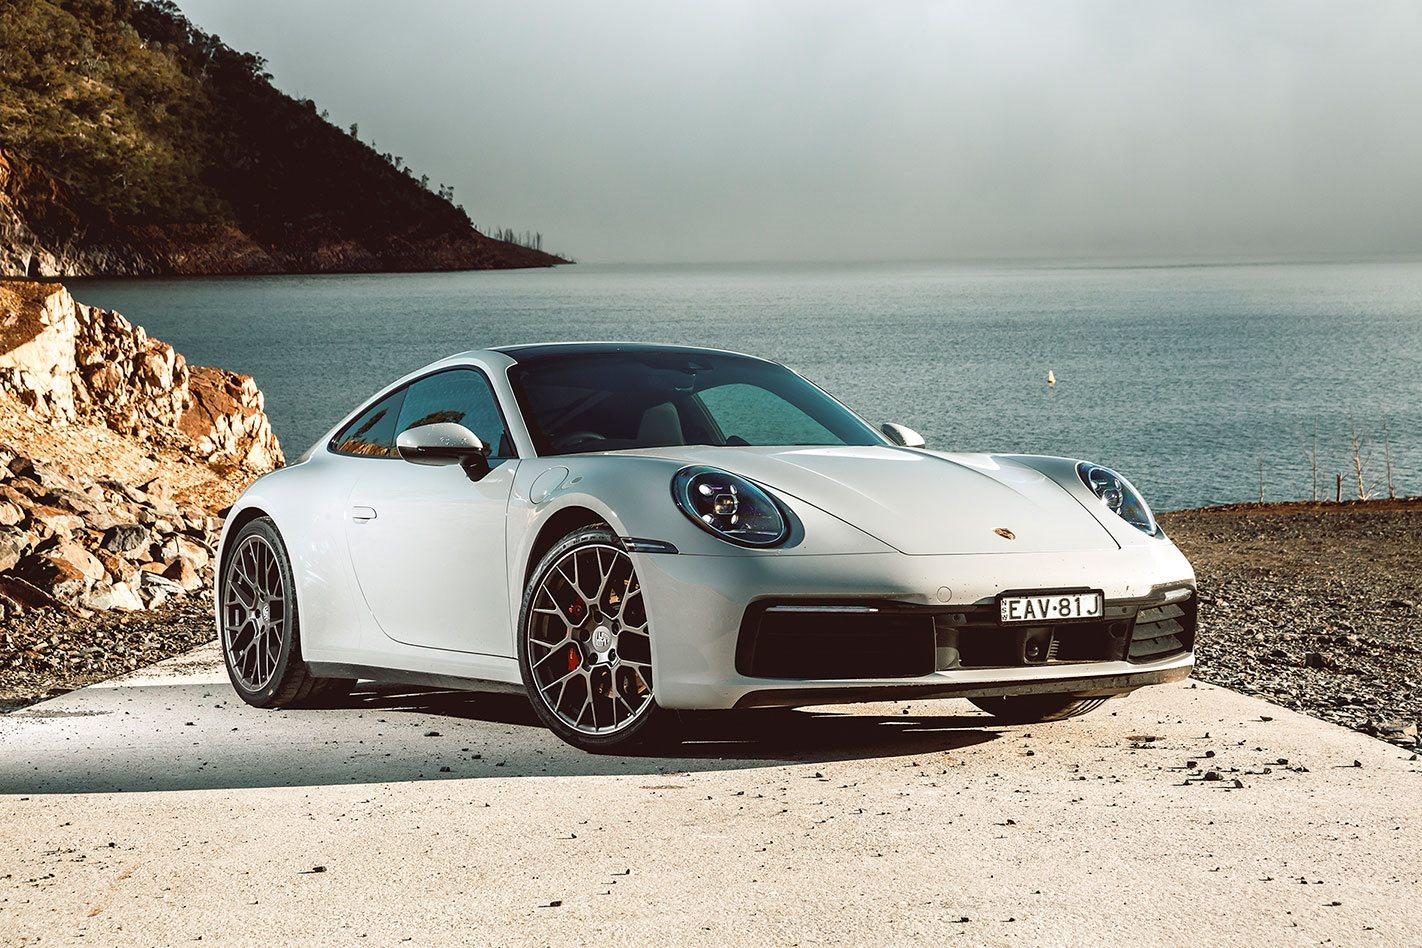 Besting the Porsche 911 is an unenviable task